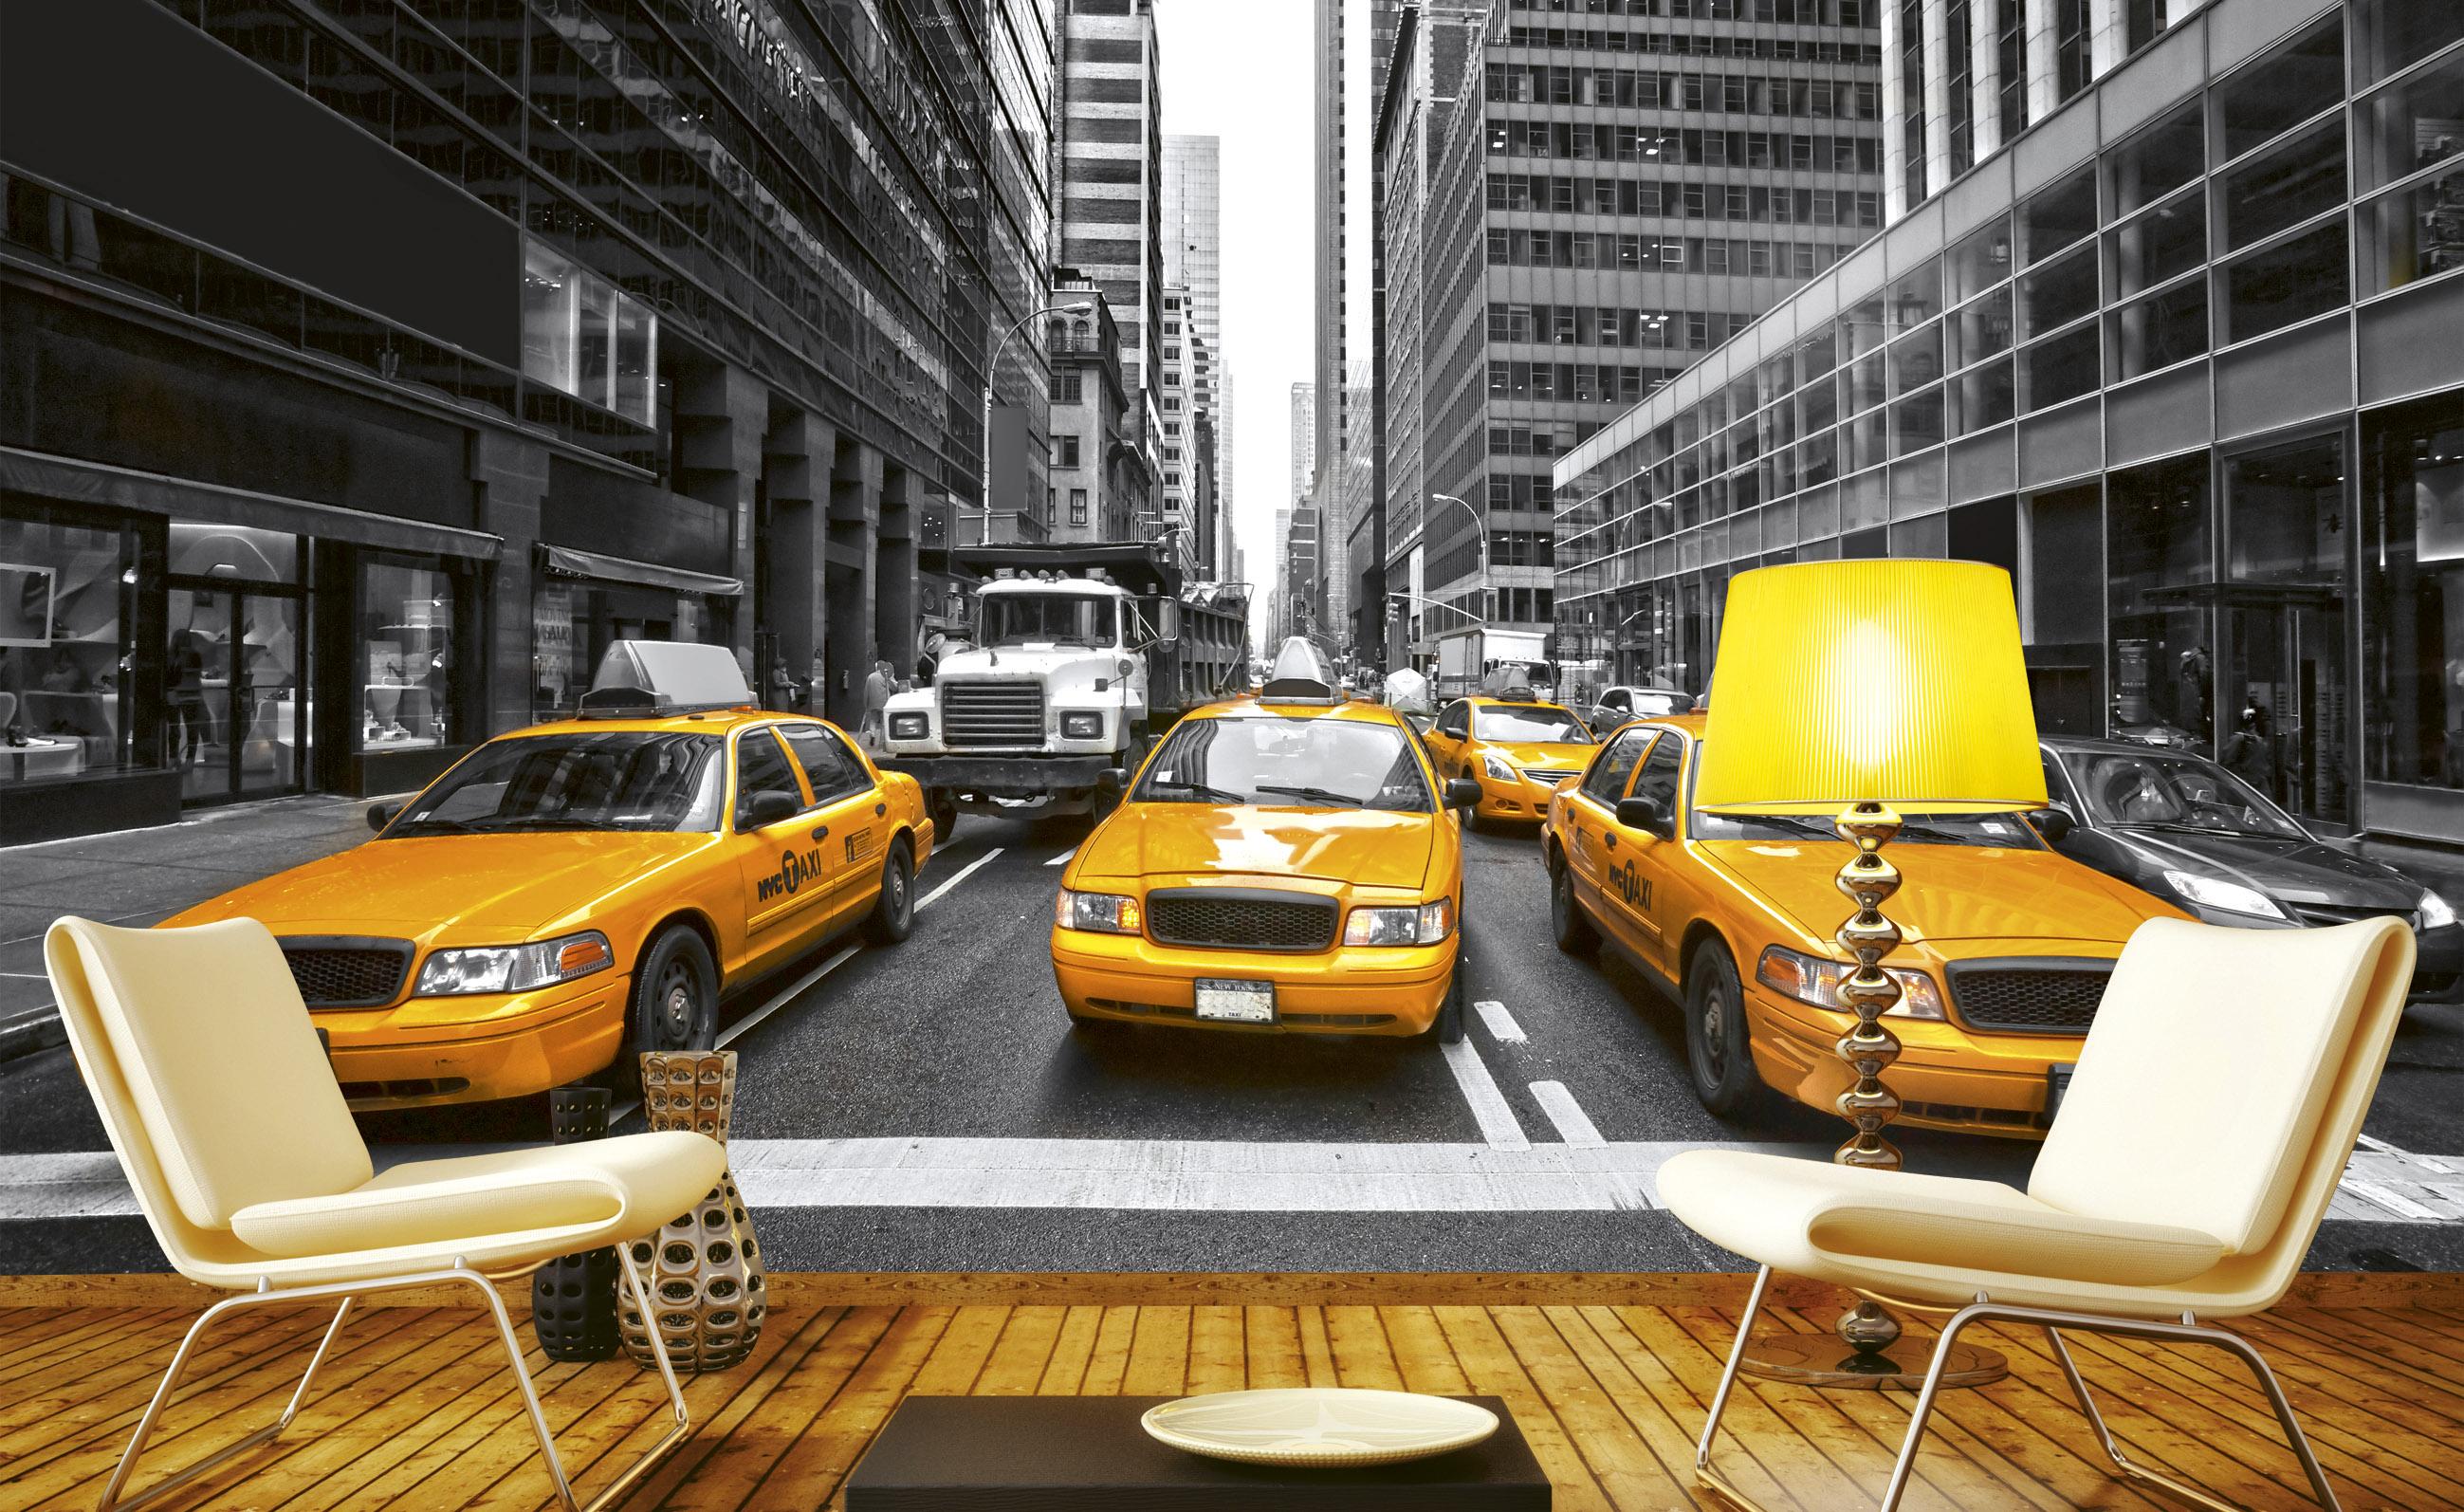 Fototapet Yellow Cabs